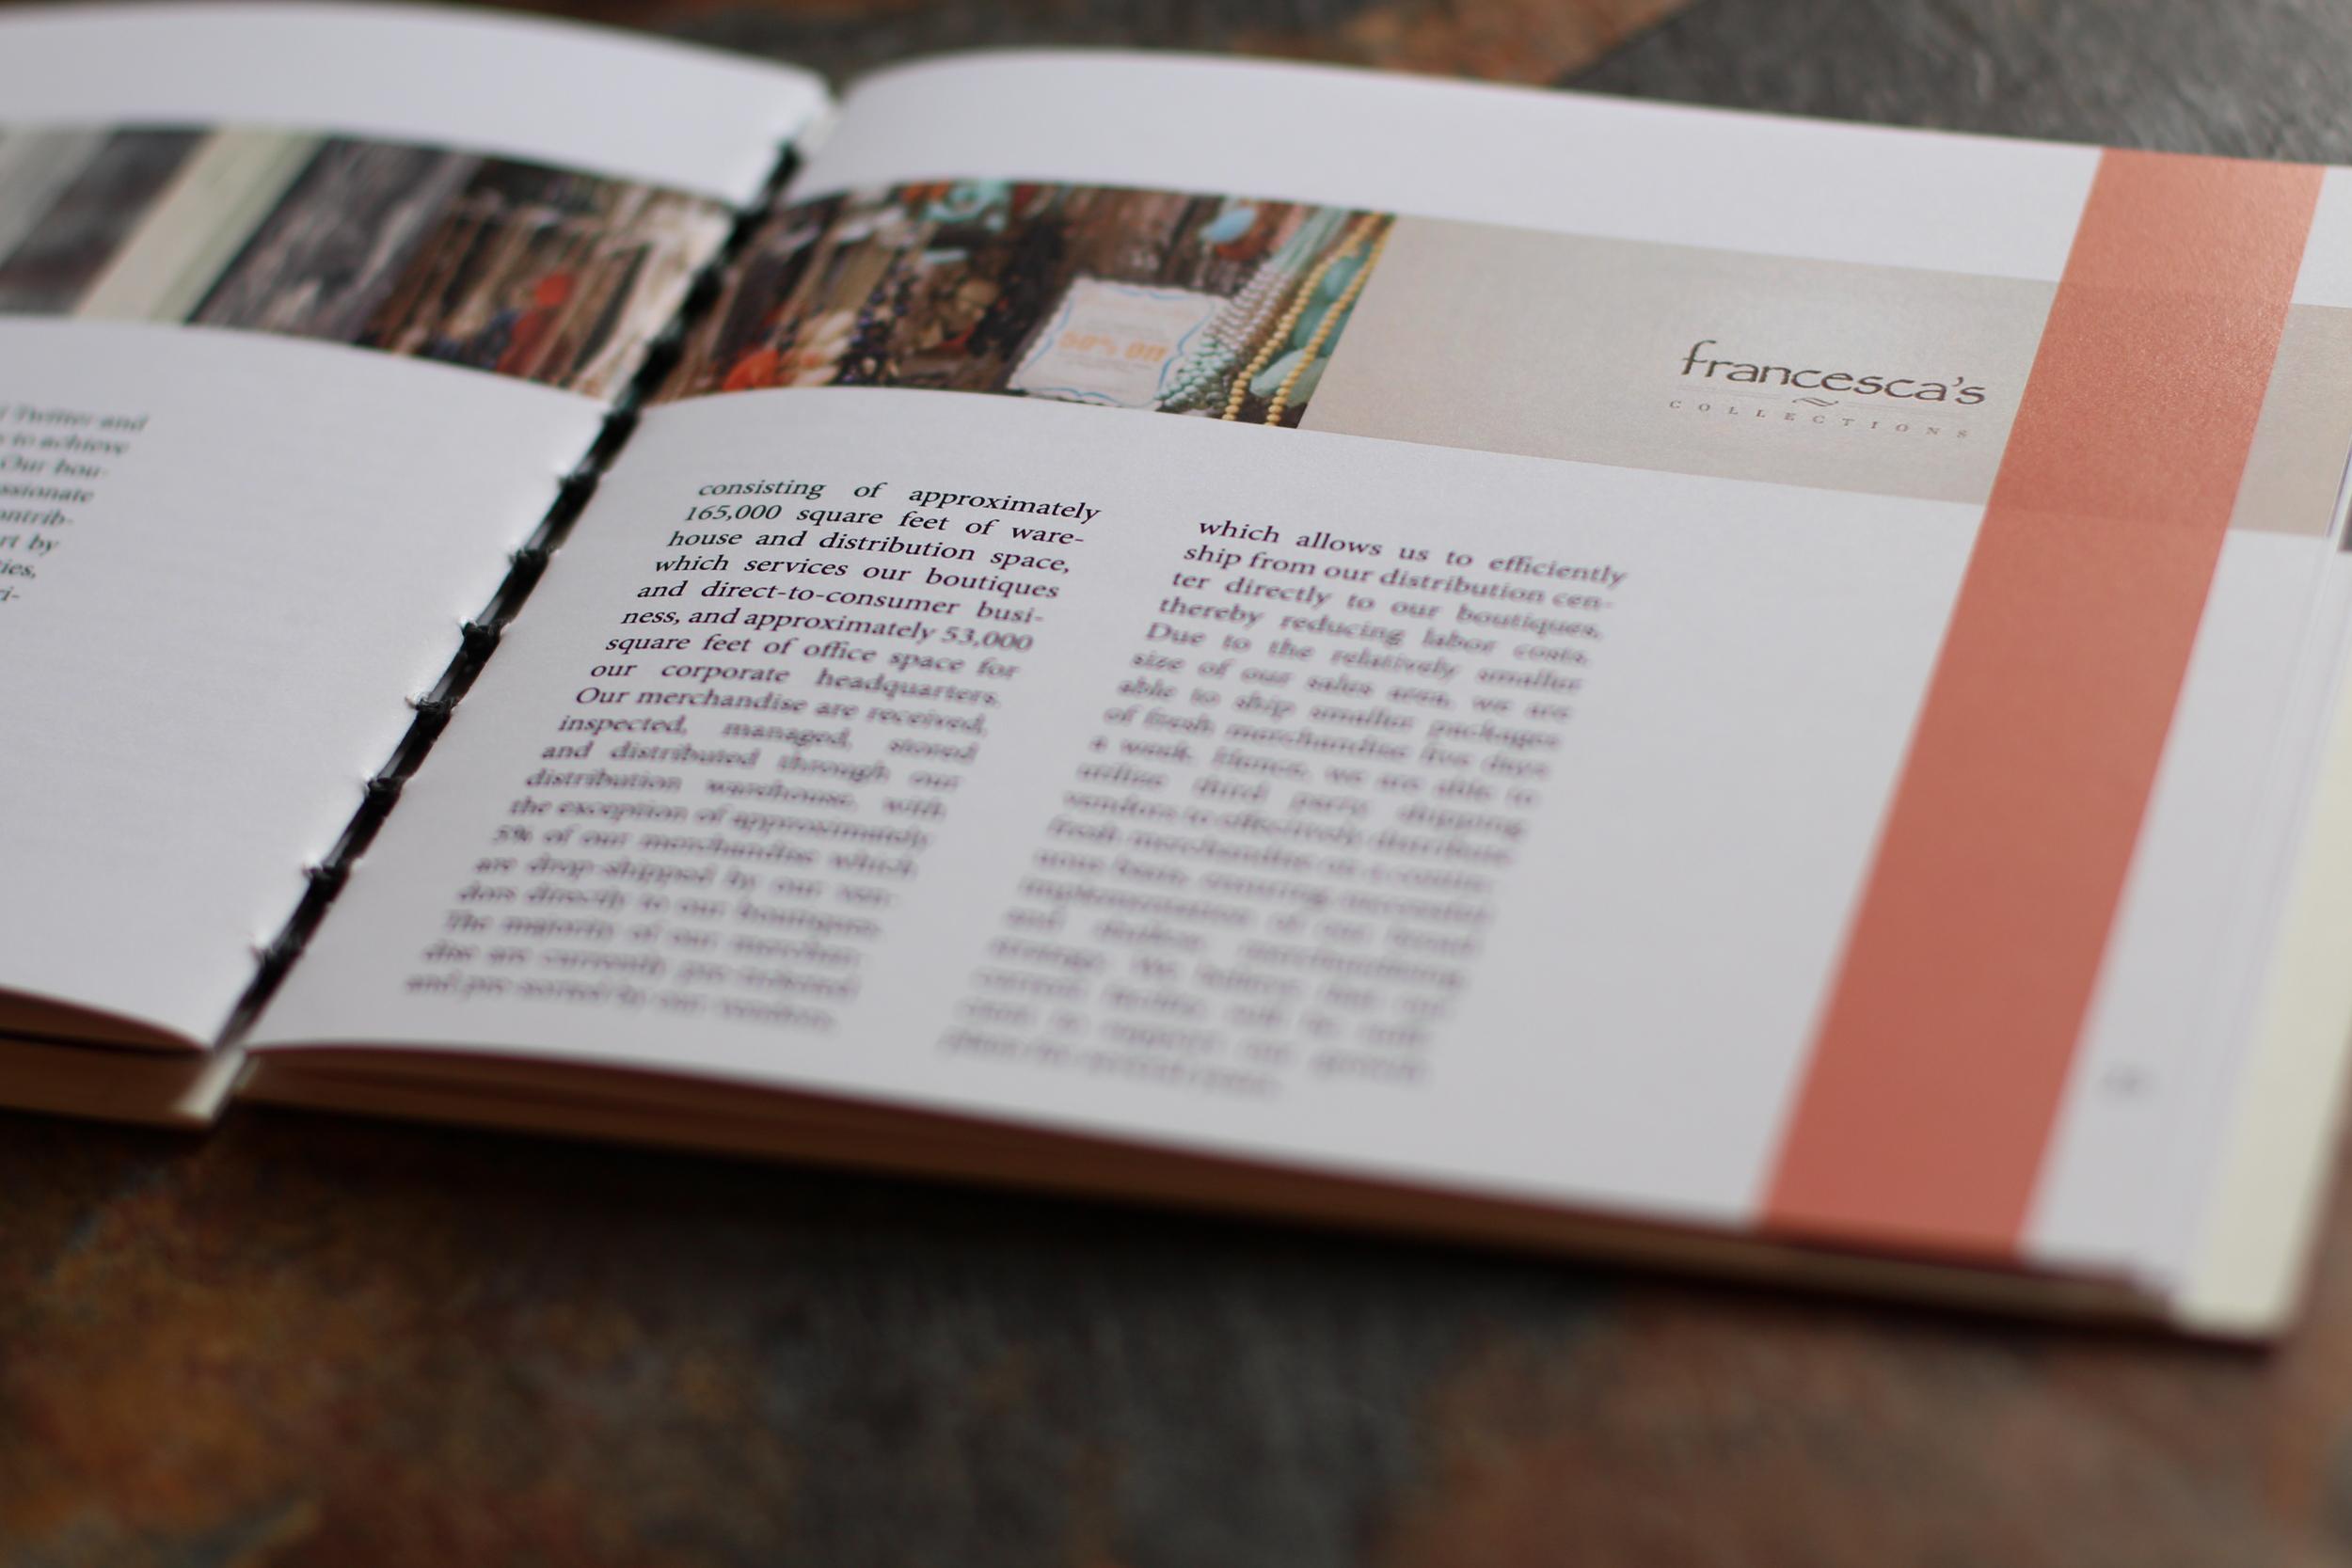 francesca's_annual_report_melanie_celeste_4.JPG